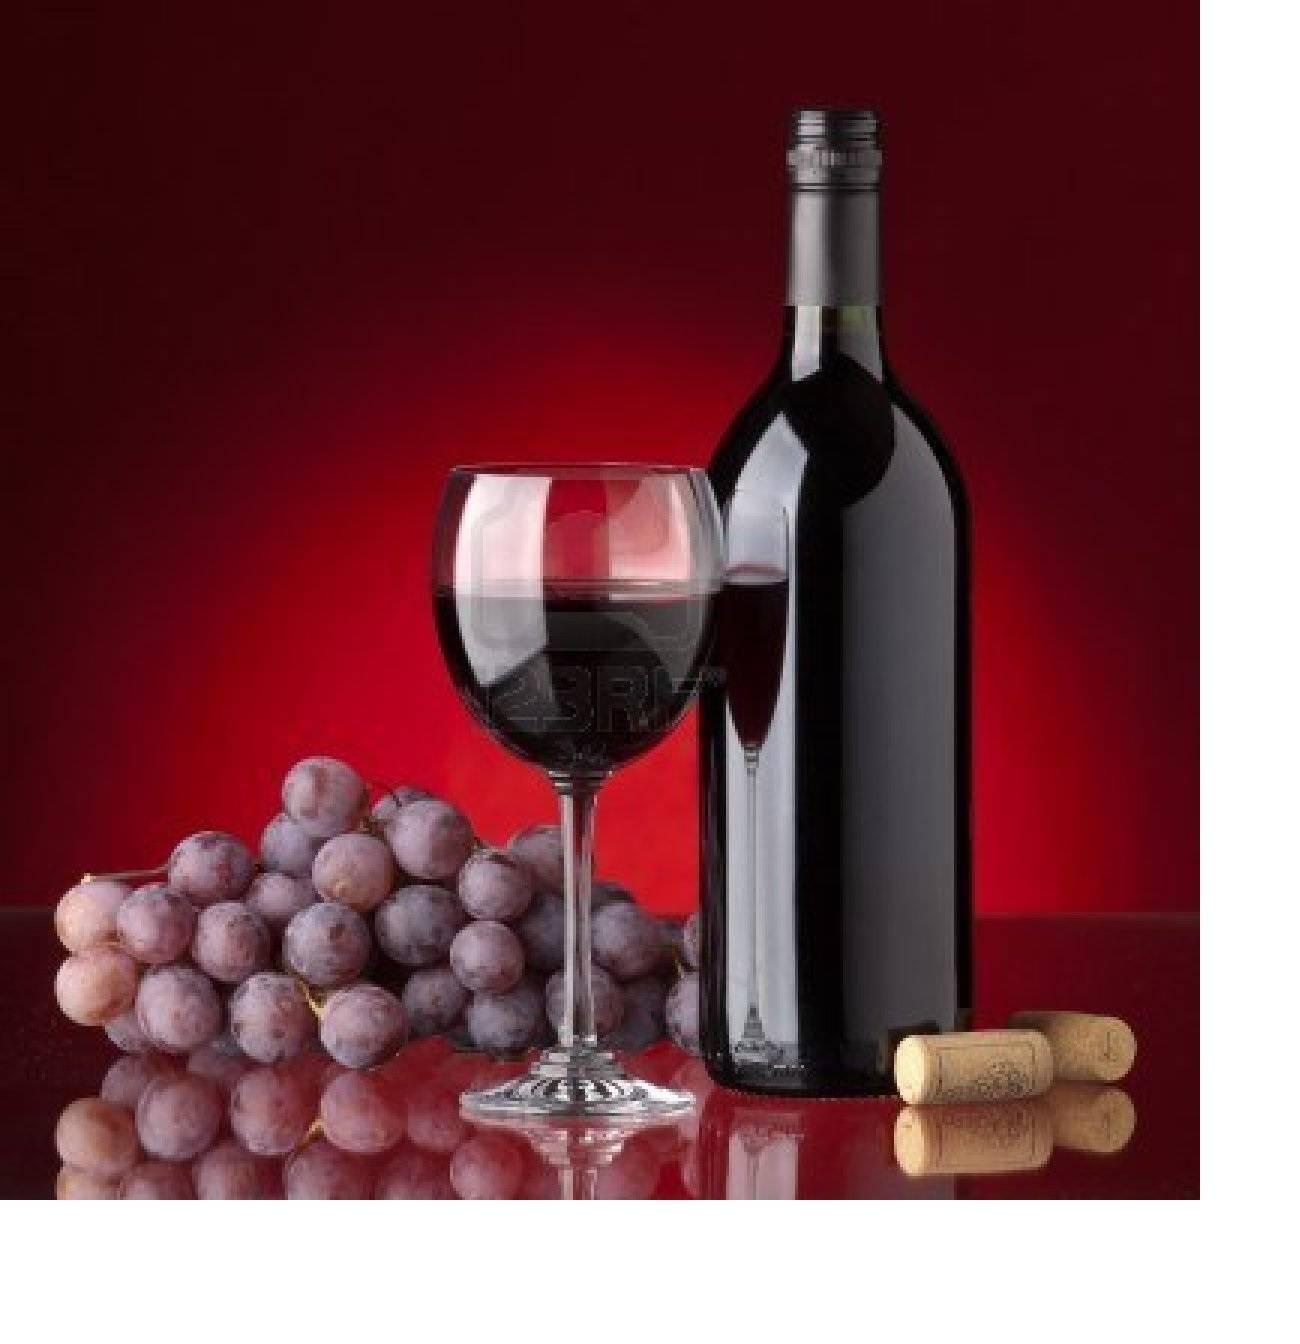 Italian wines labels